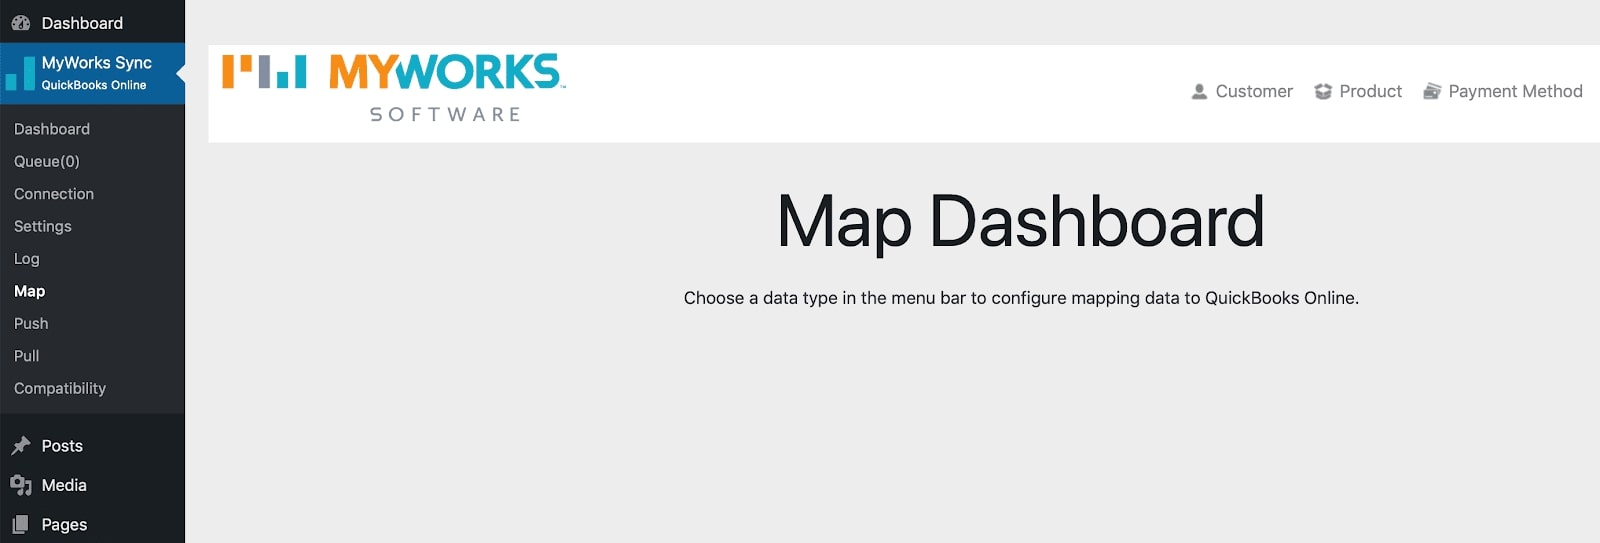 The Map Dashboard